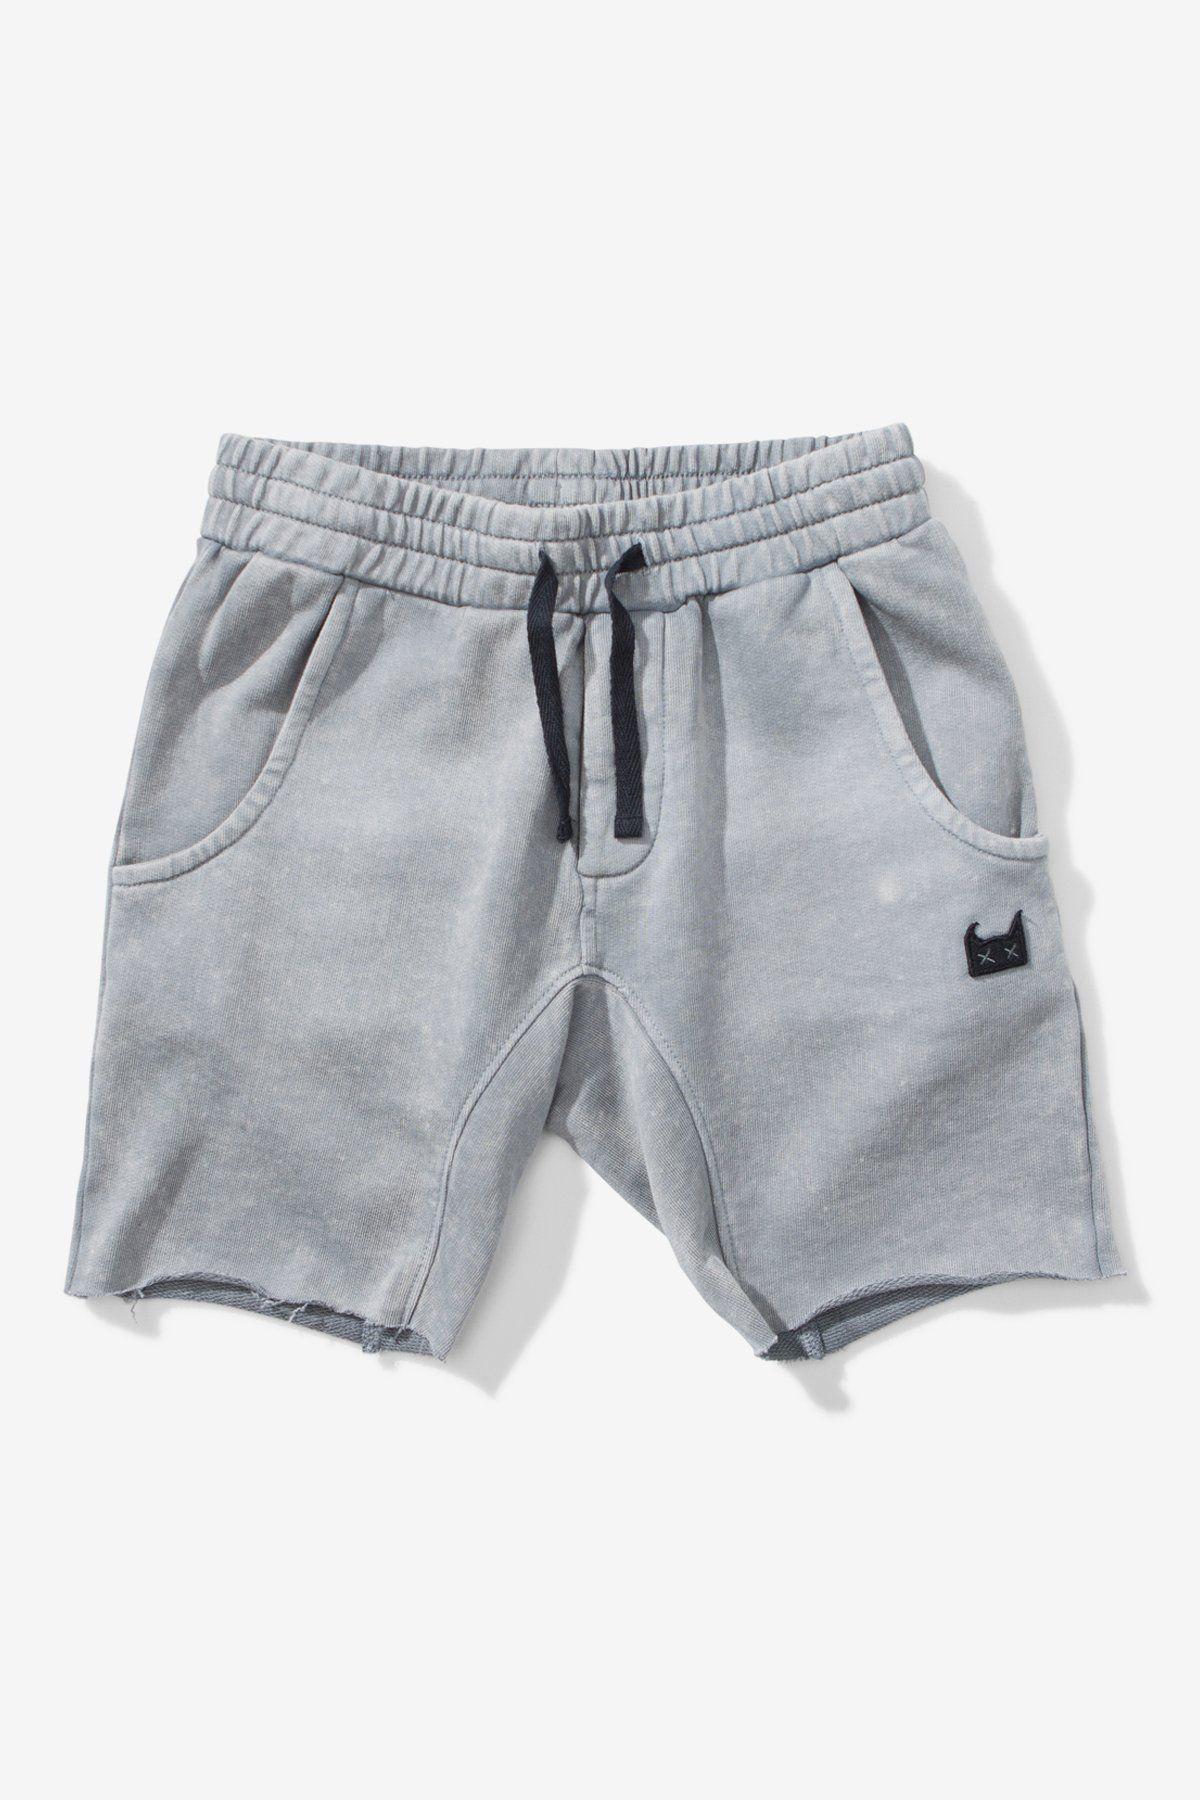 Munster Kids All Faden Shorts - Washed Grey